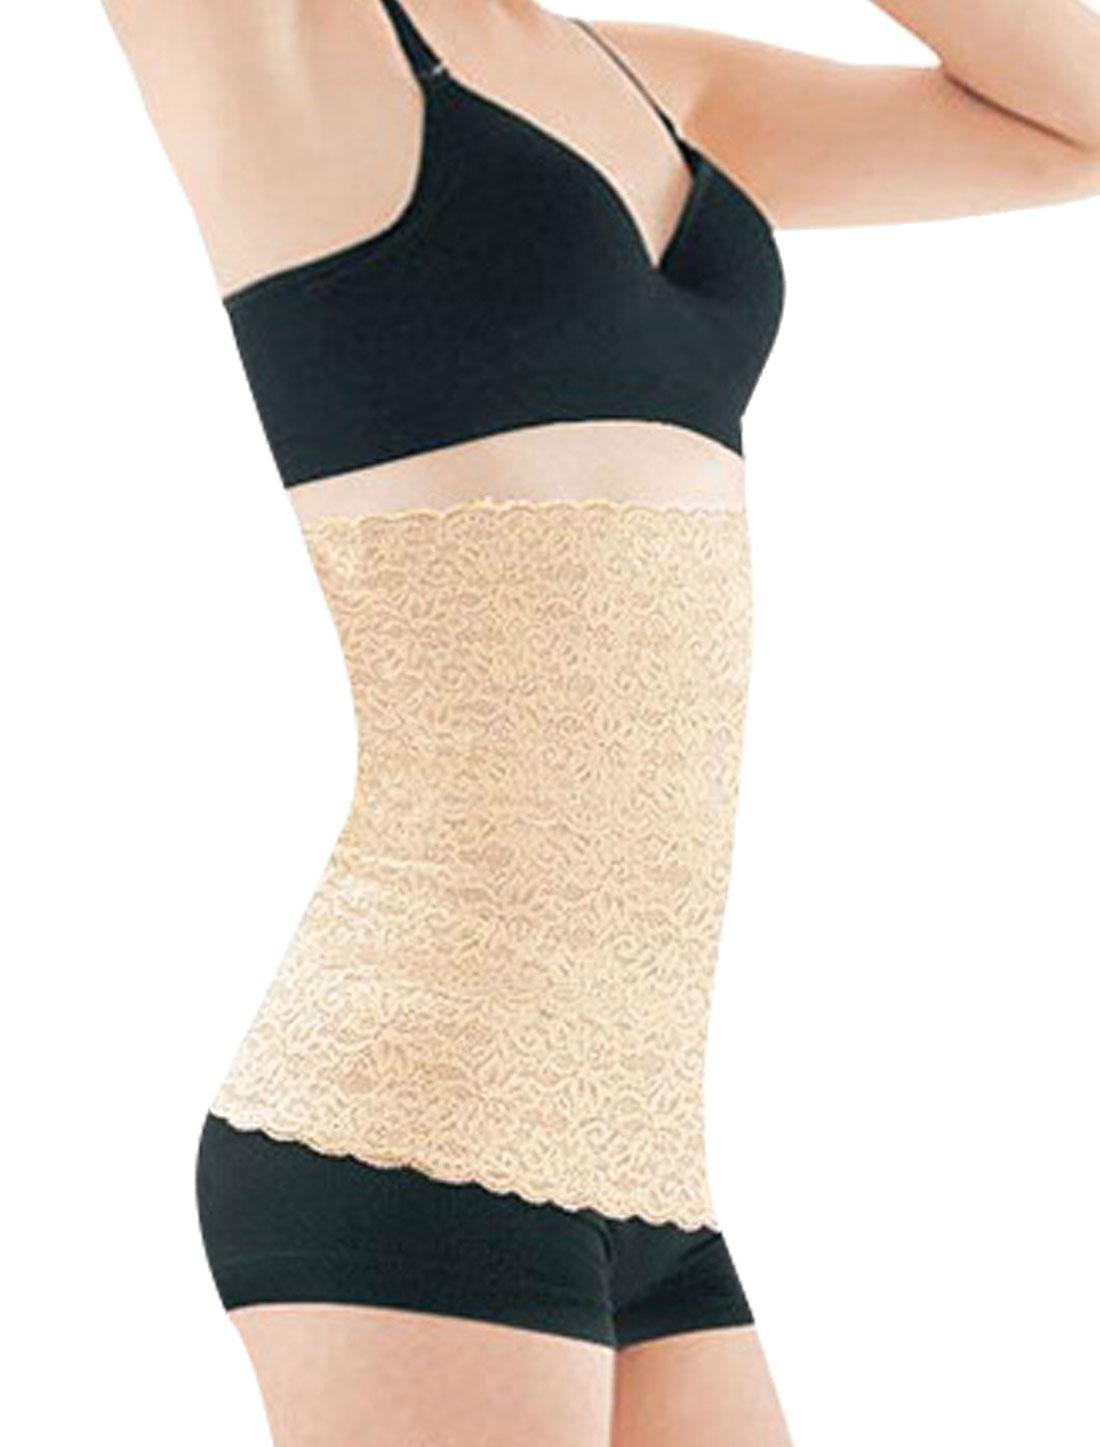 Women Floral Printed Tummy Girdle Belt Shapewear Corset Waist Cincher Beige XS